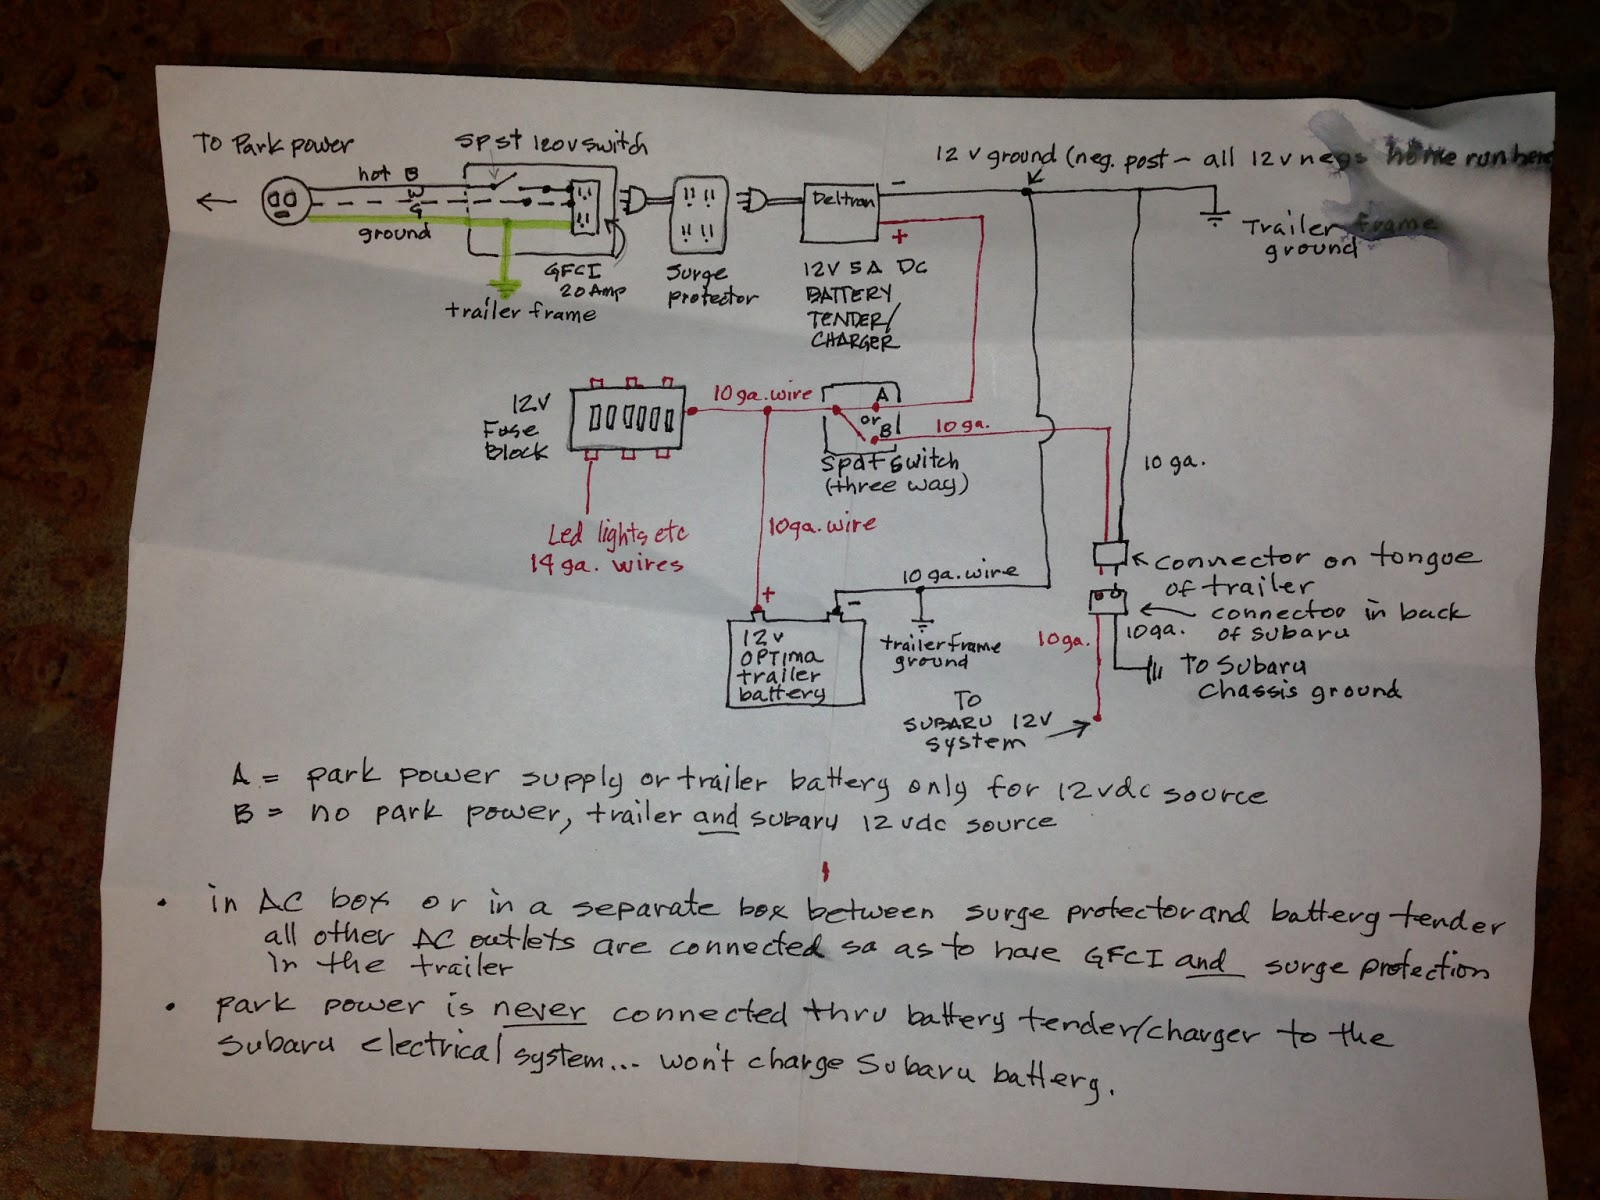 teardrop camper wiring diagram 2006 f150 mirror 120v get free image about